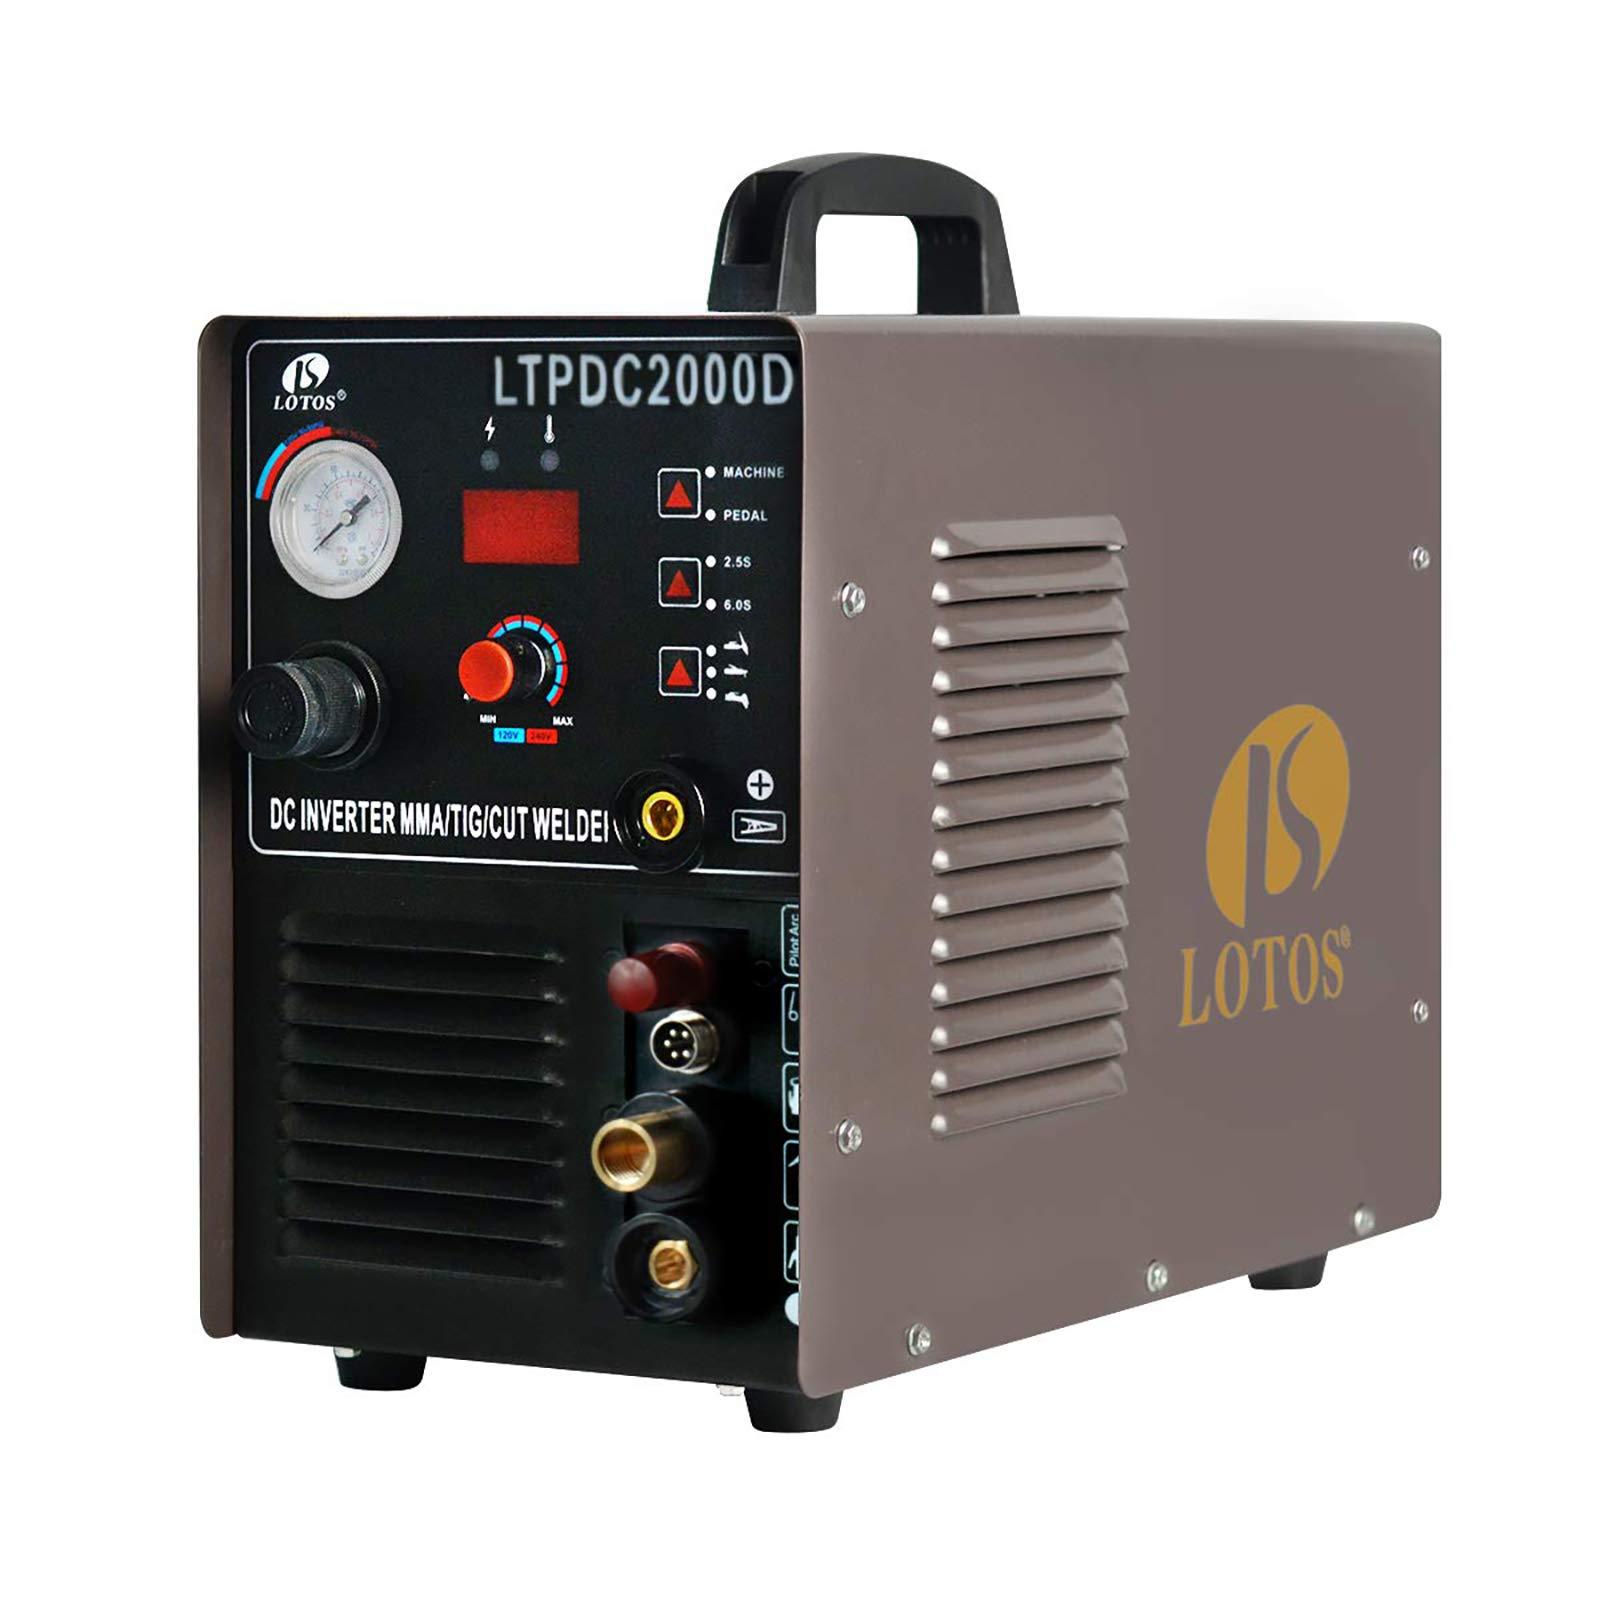 Lotos Pilot Arc Dual Voltage Plasma Cutter and 200A Tig/Stick Welder LTPDC2000D